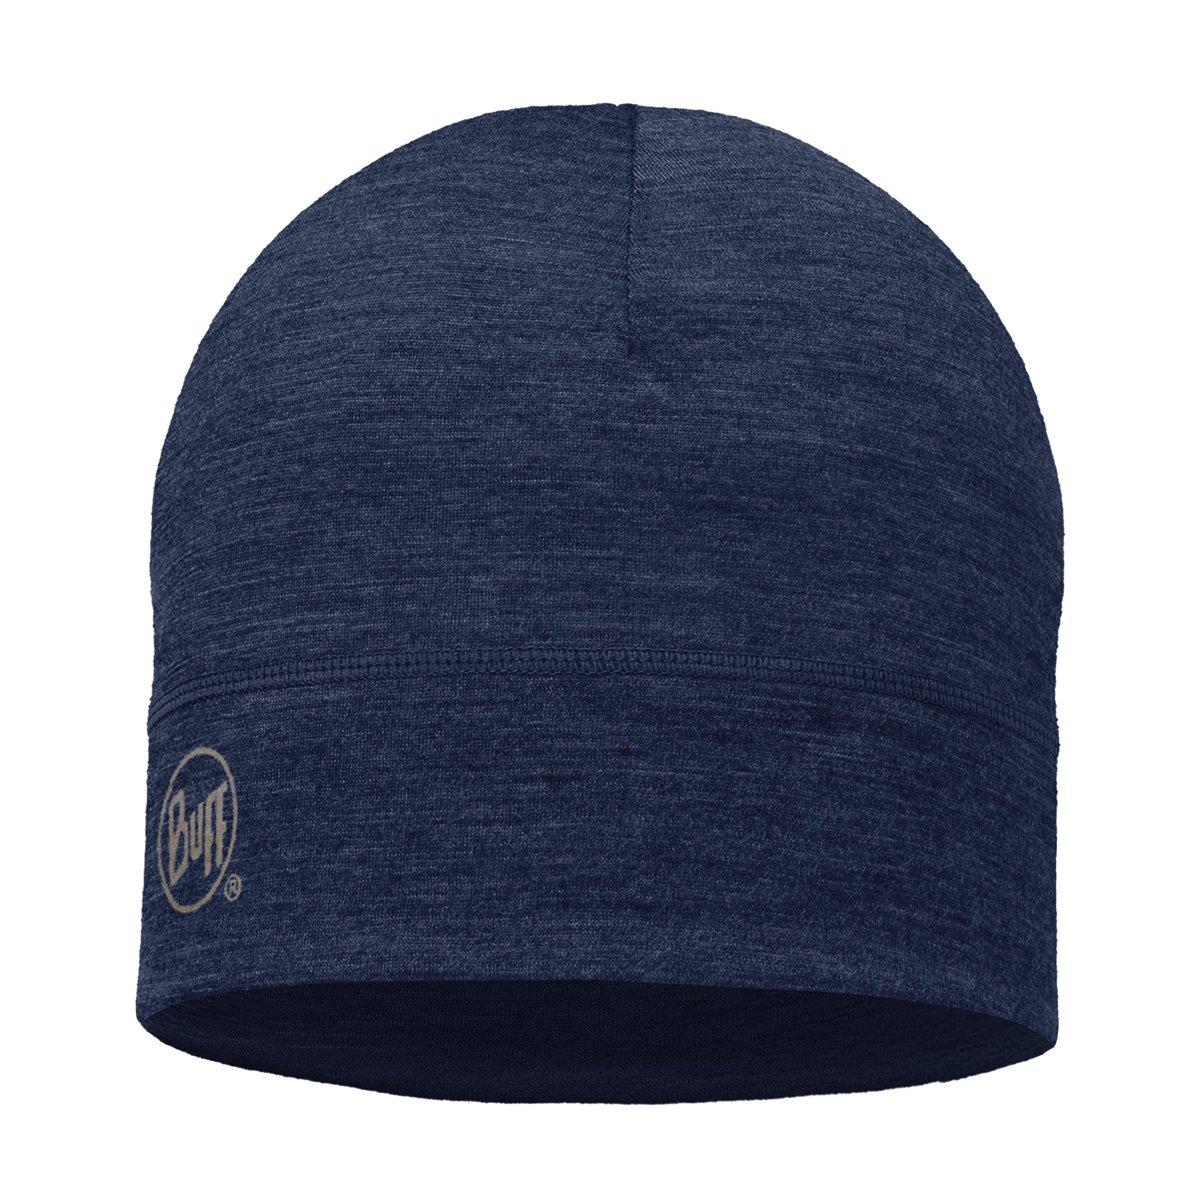 a7221d7ea17 Amazon.com  Buff Lightweight Merino Wool Hat  Sports   Outdoors